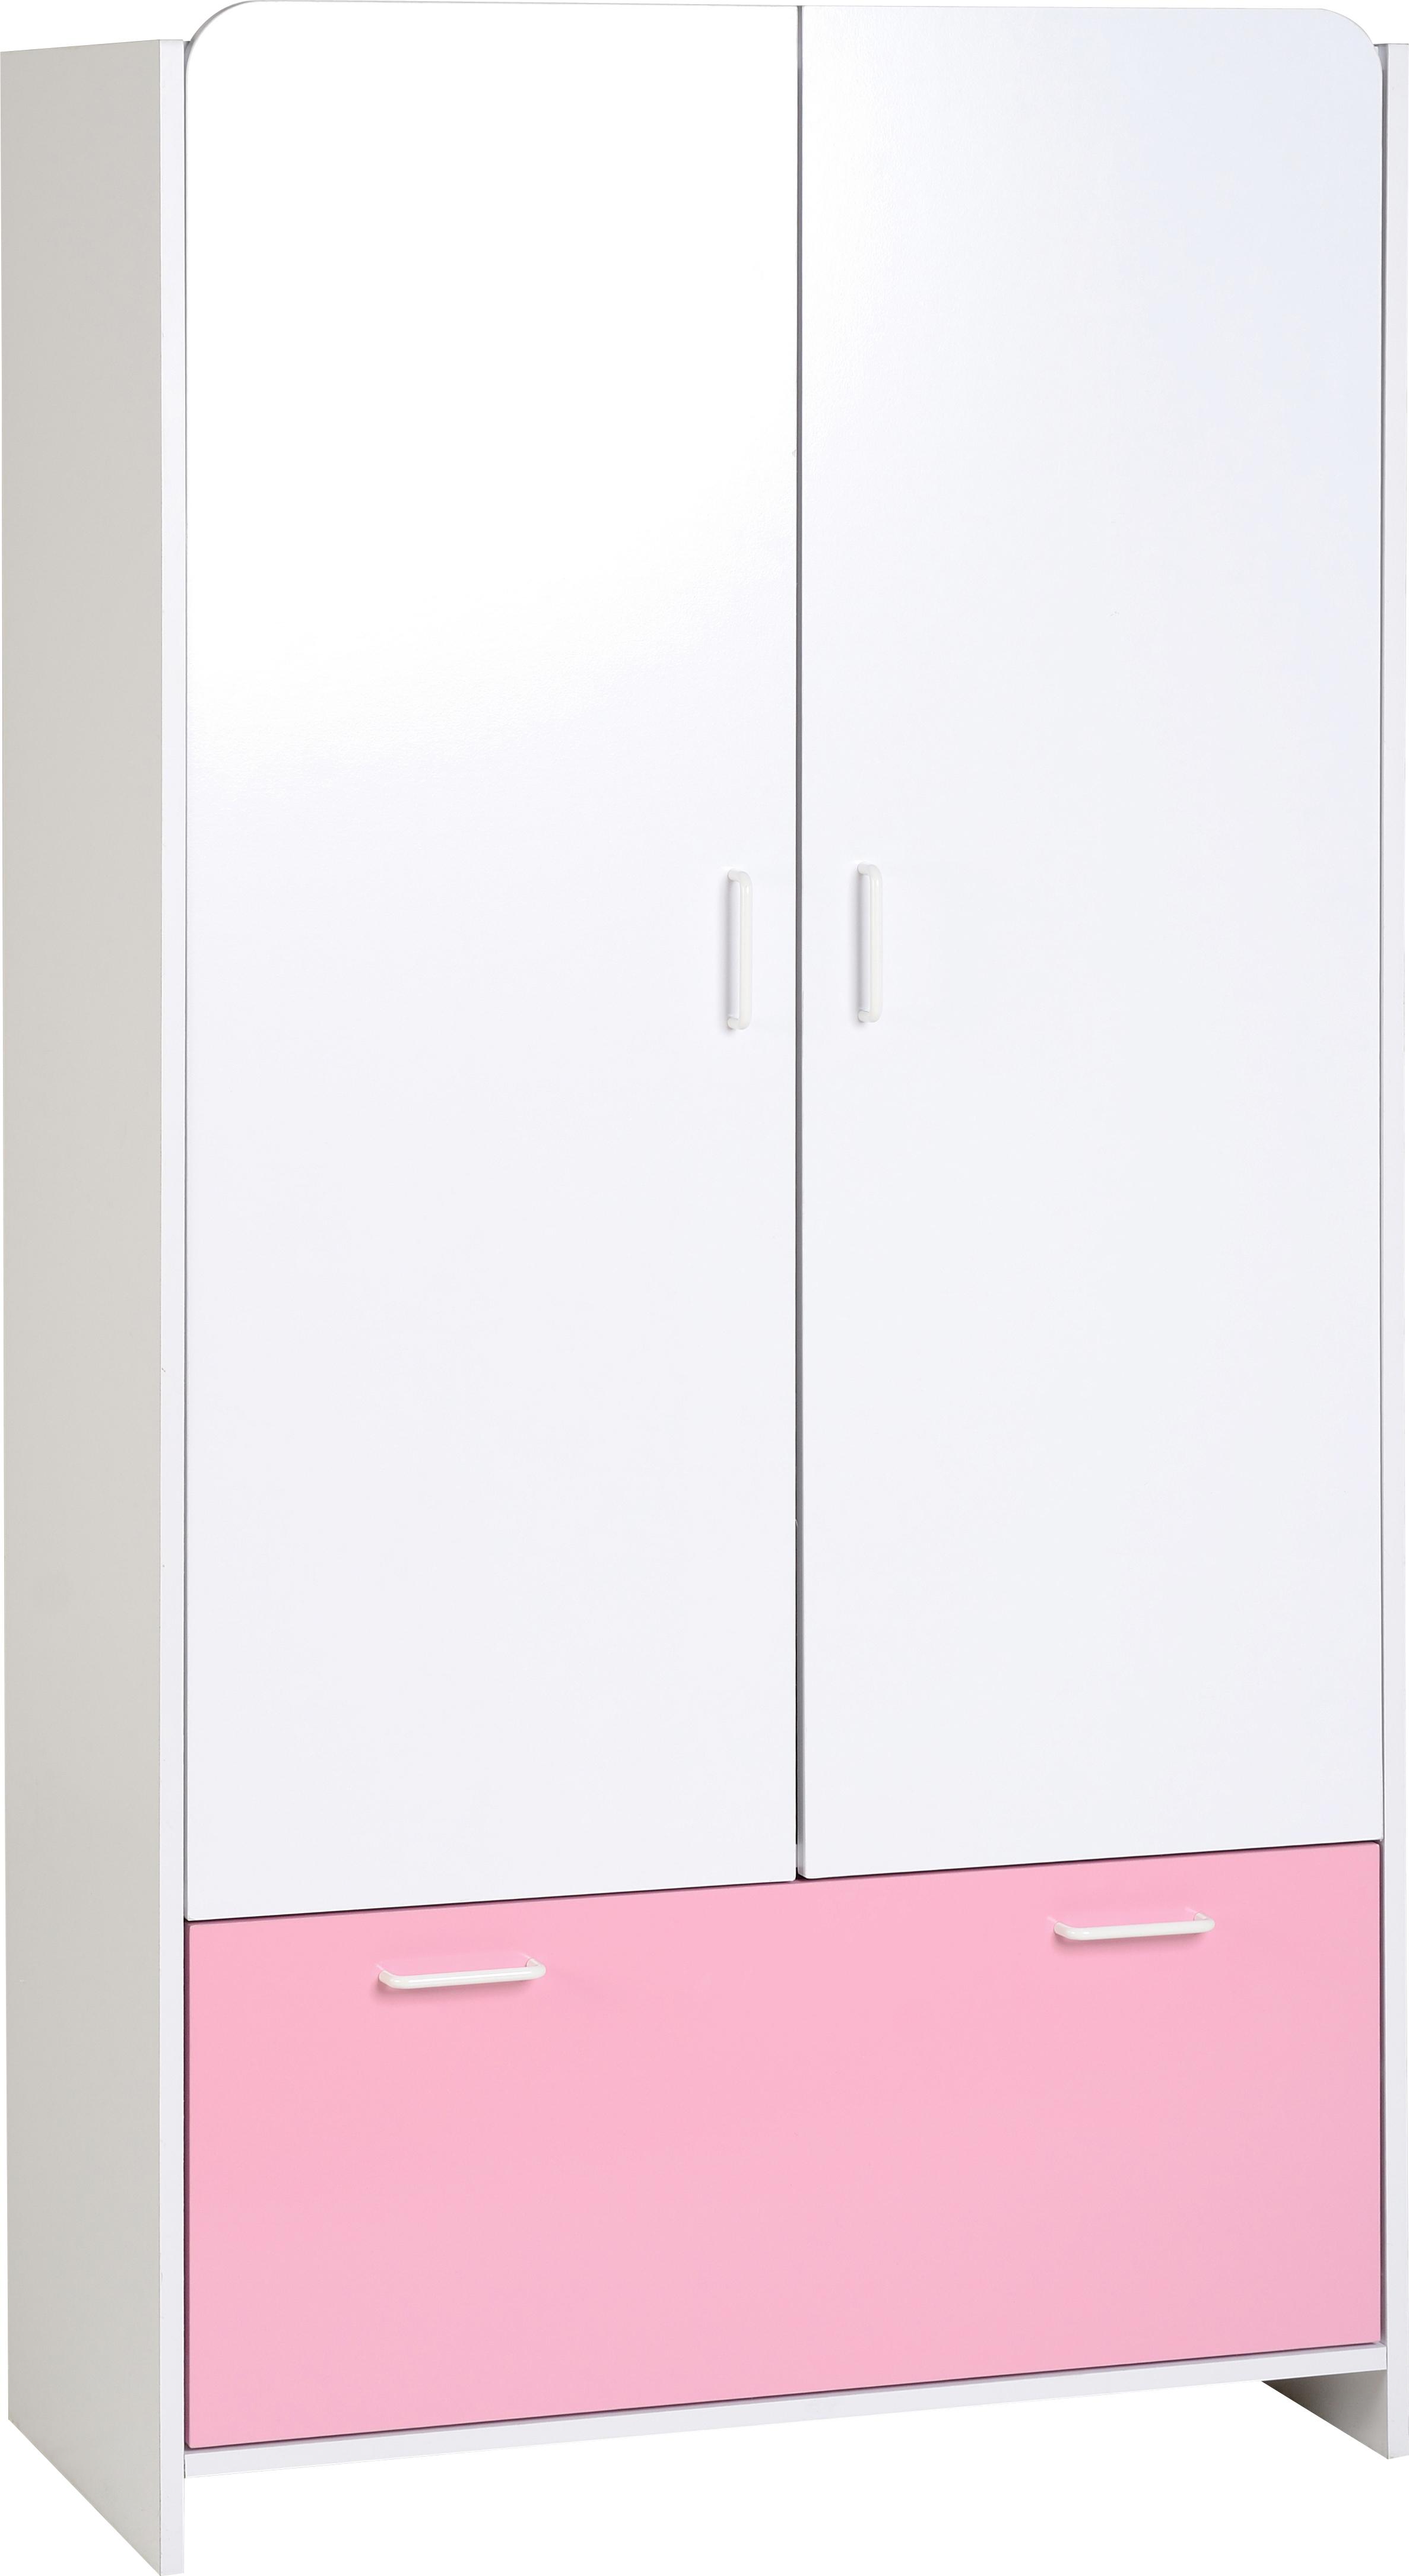 Lollipop Robe Pink 01